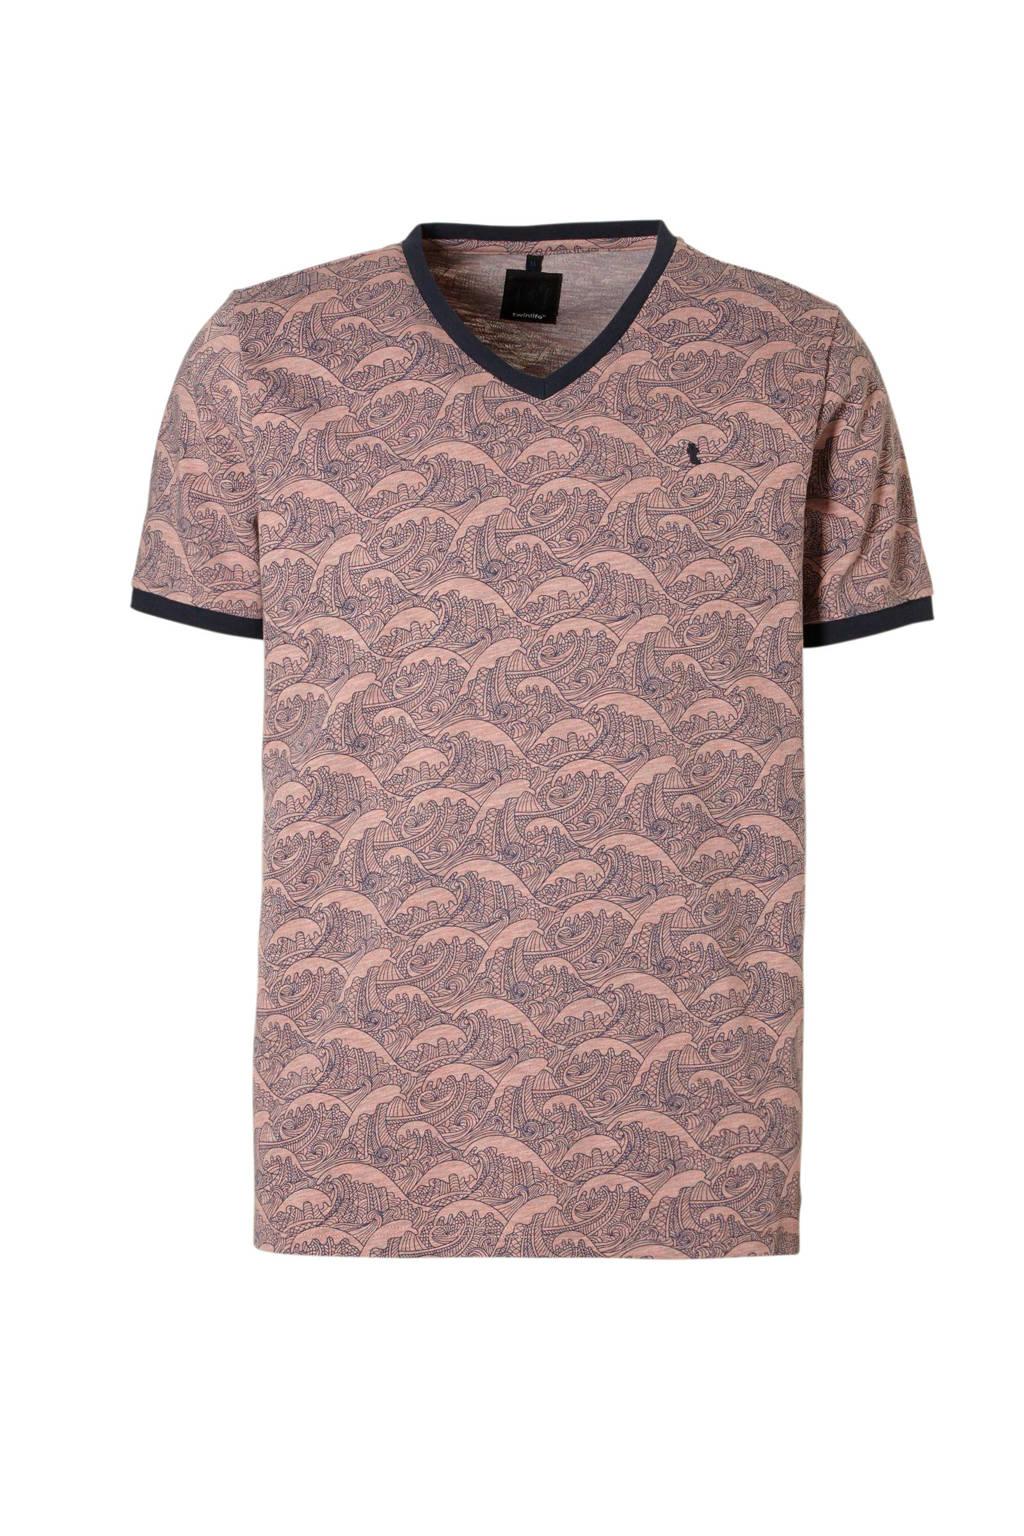 Twinlife t-shirt, Roze/donkerblauw